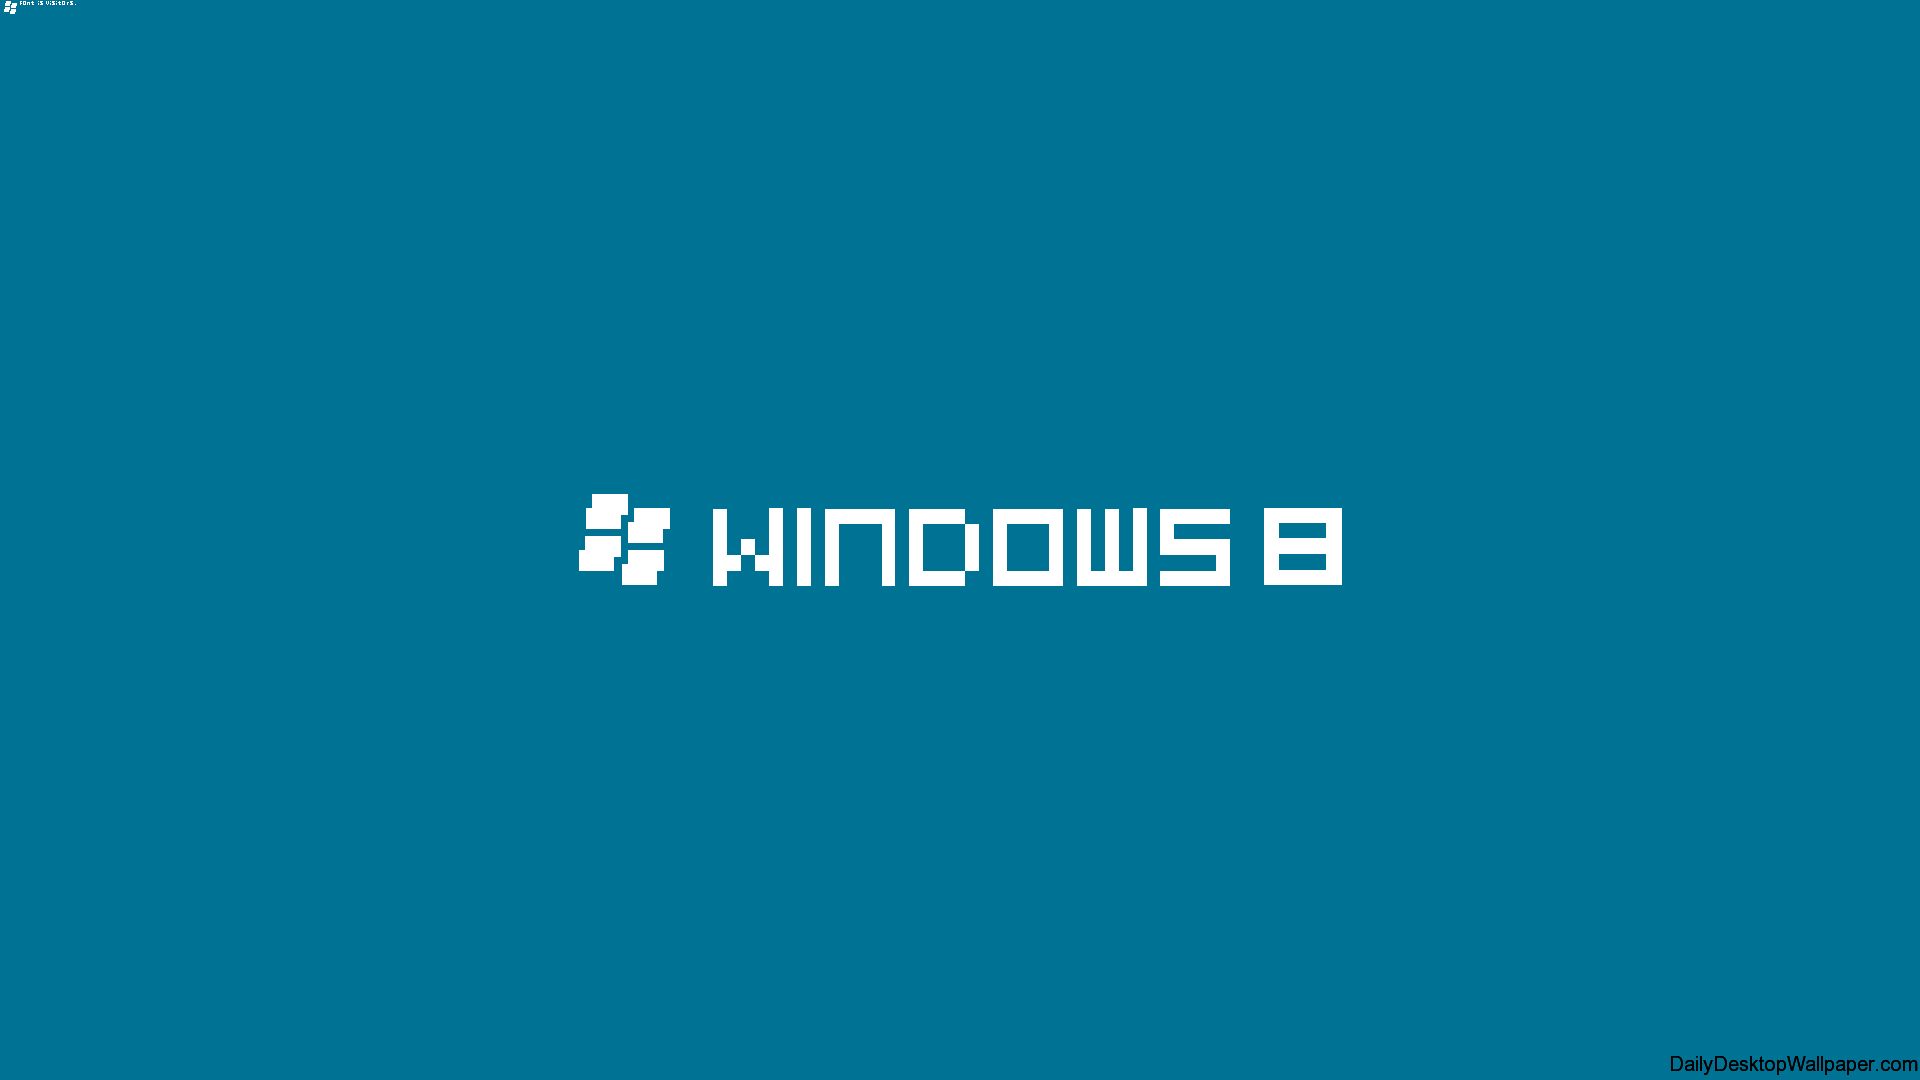 Windows 8 Pixelated Wallpaper